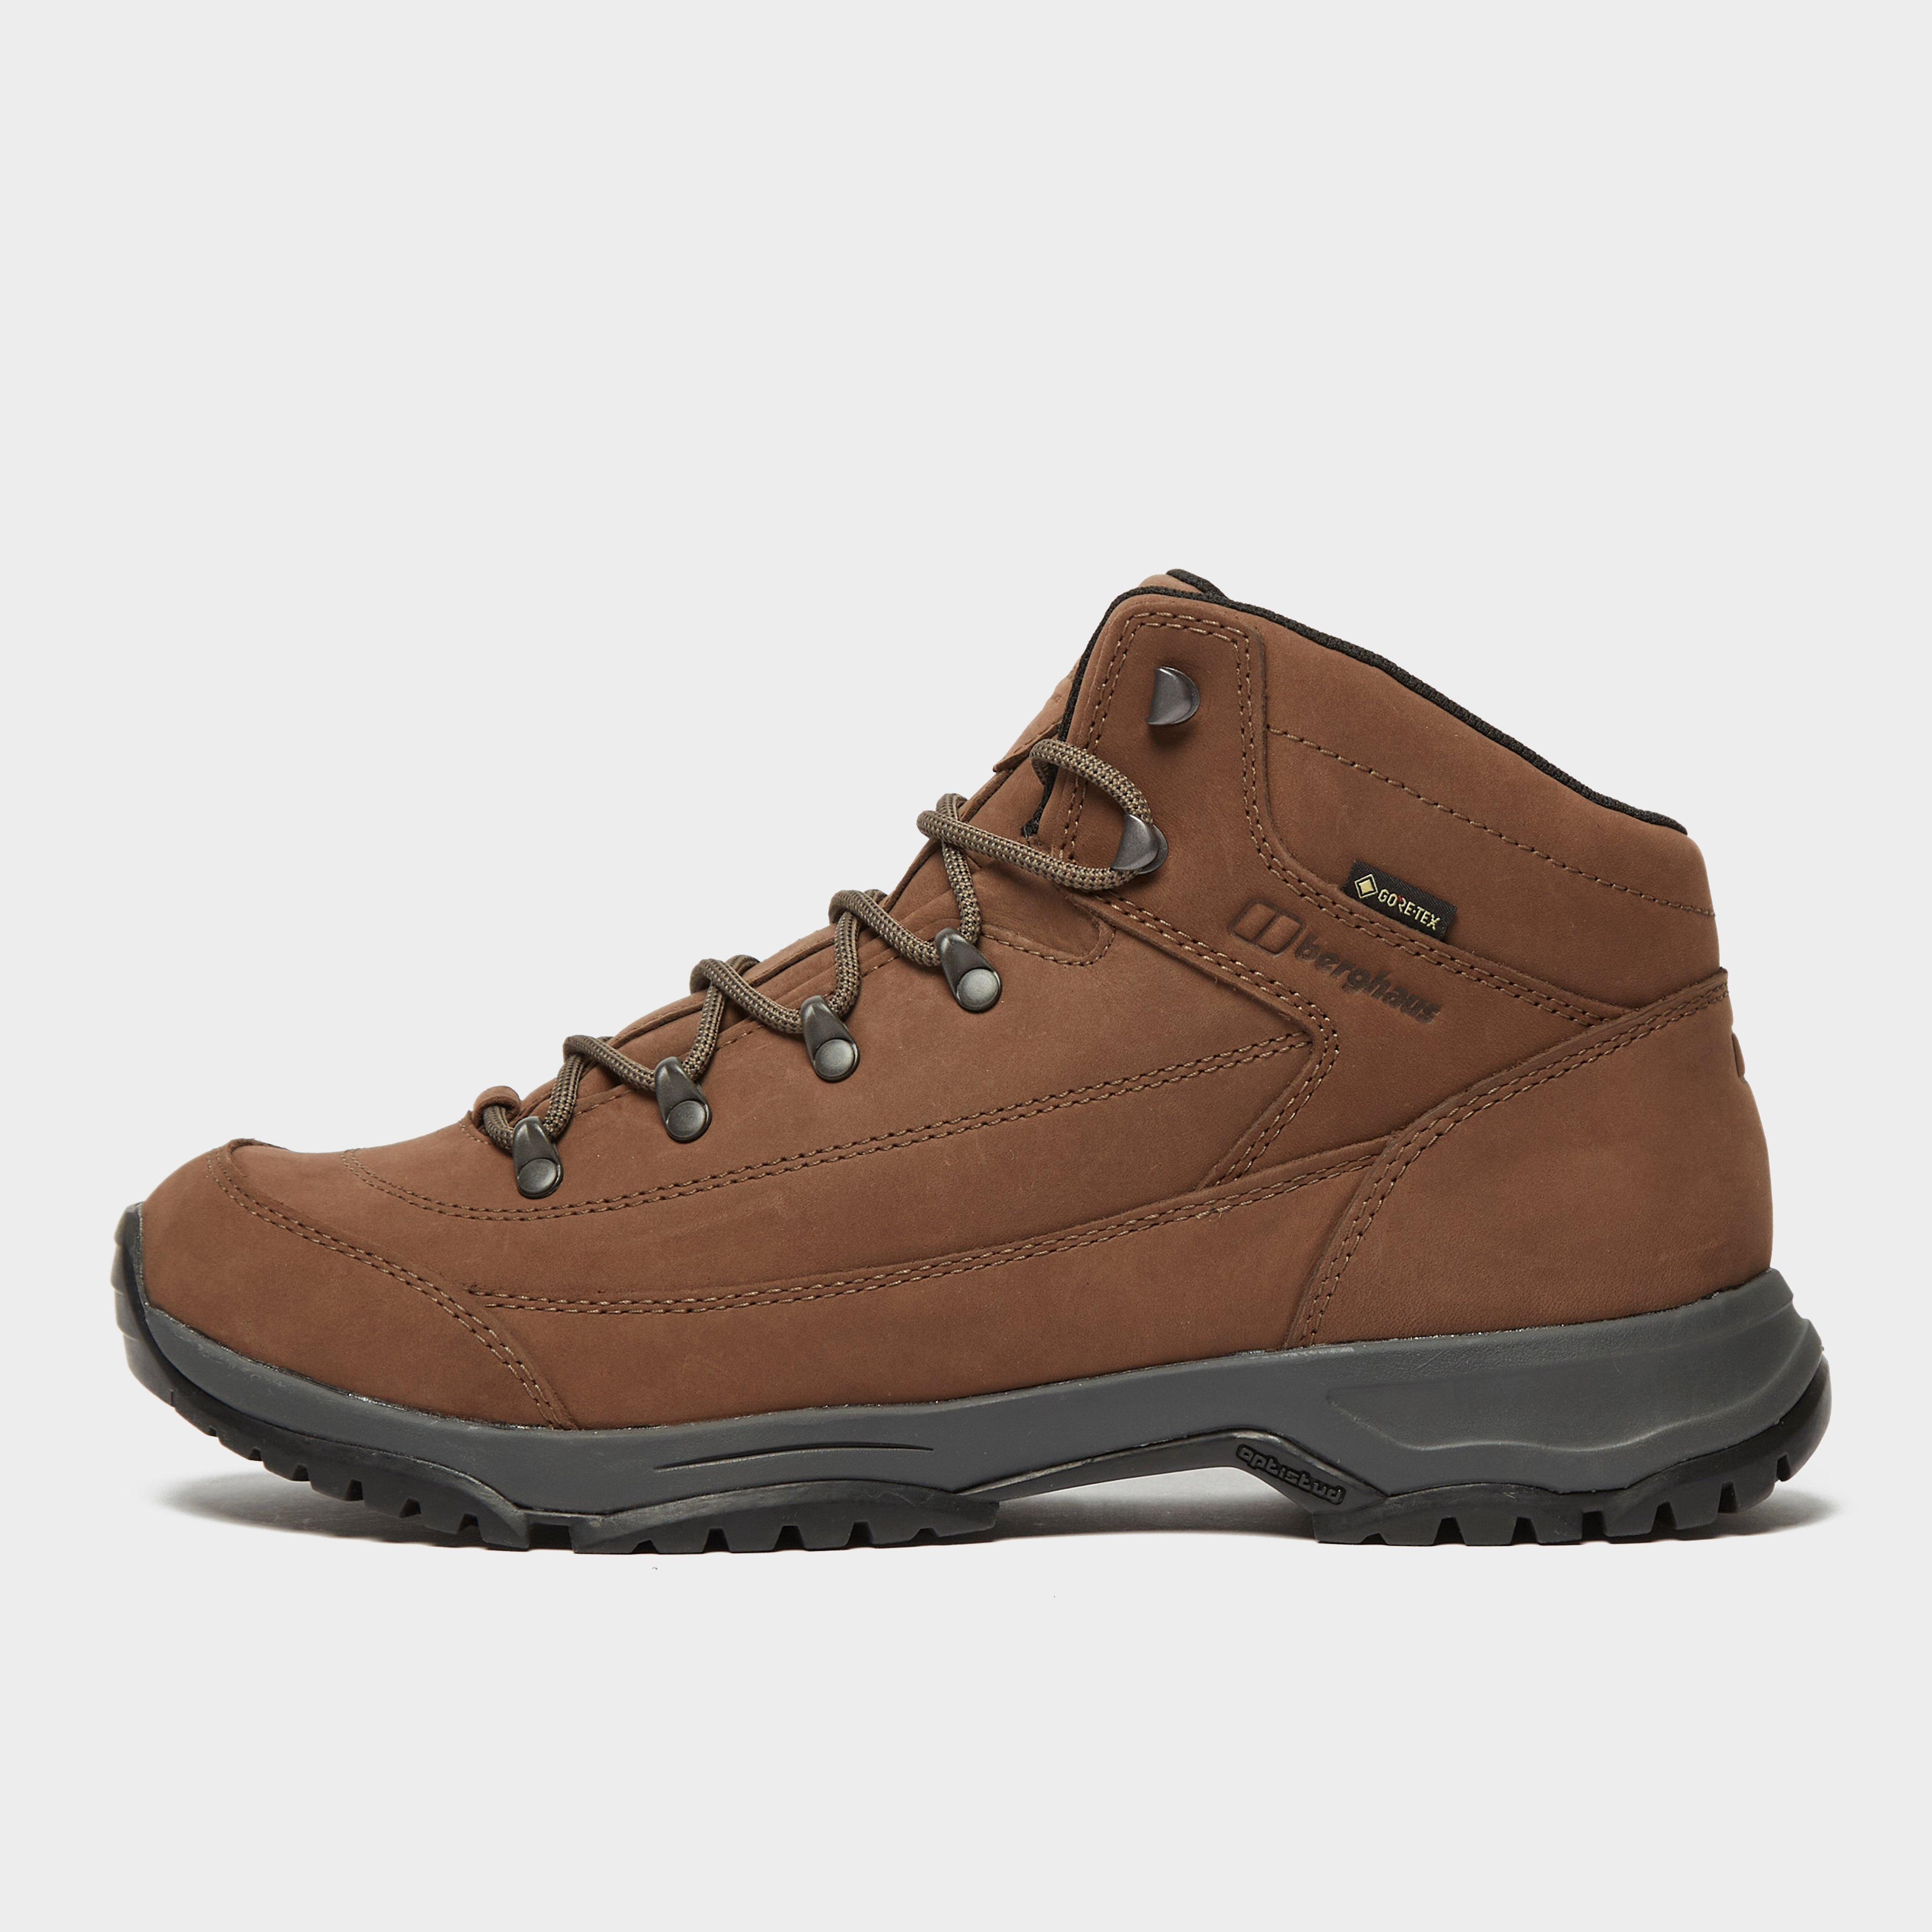 Berghaus Men's Dalemaster Low Gore-Tex Walking Shoe - Brown, Brown